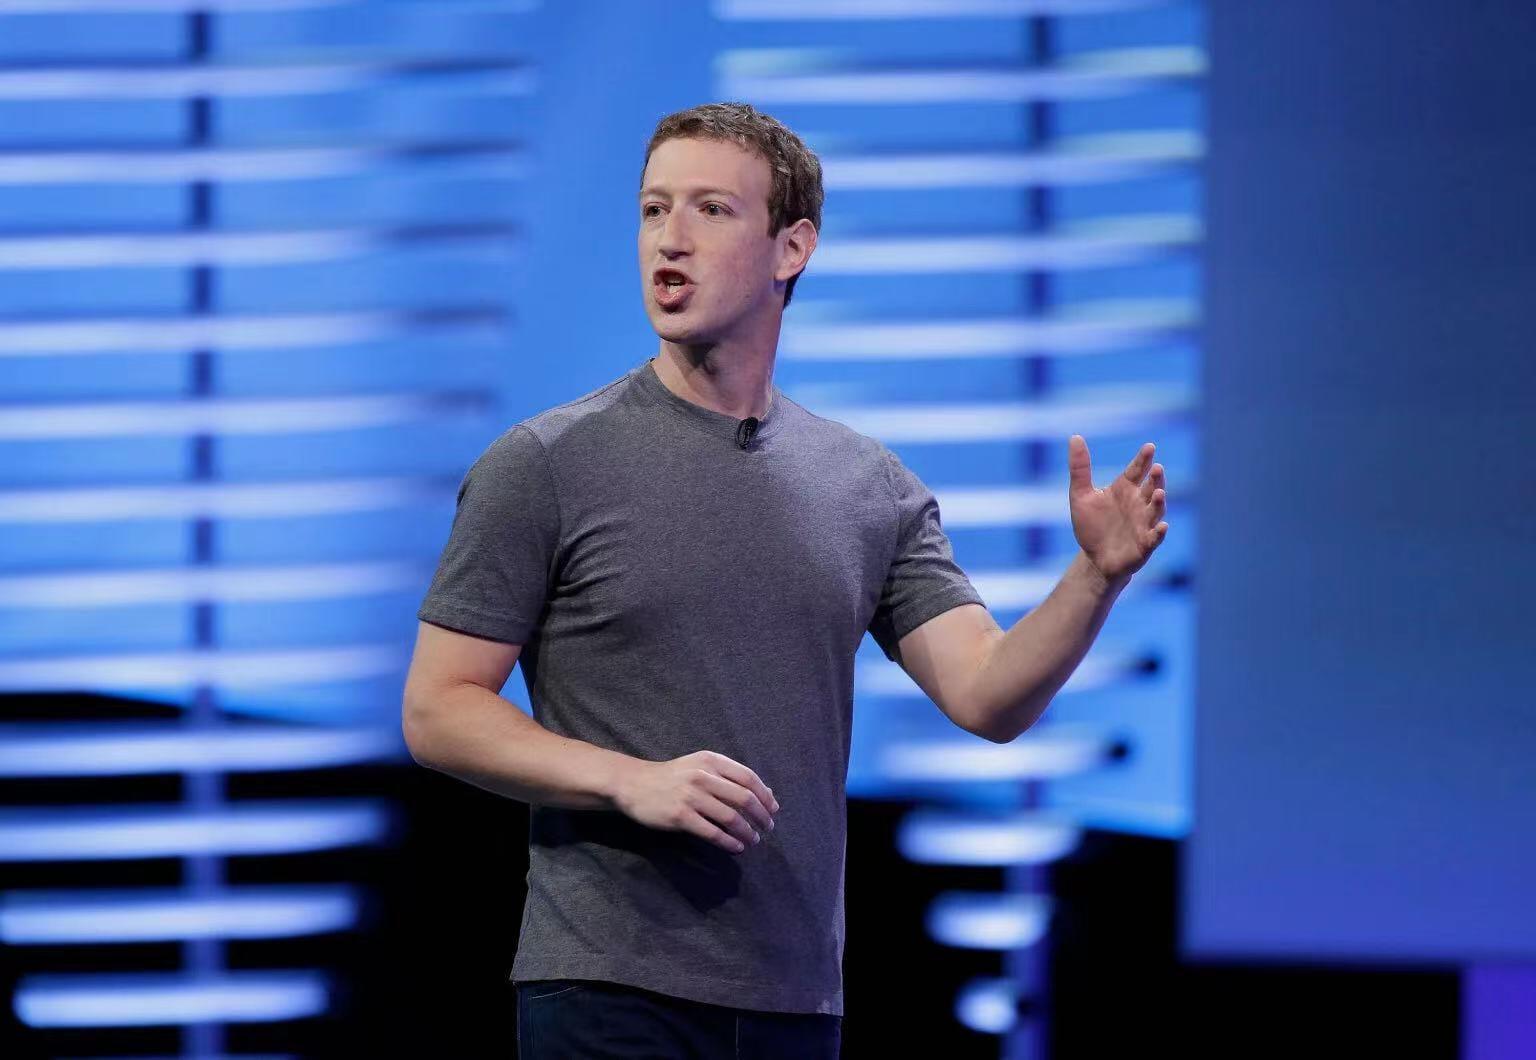 https://techcrunch.com/2018/01/04/mark-zuckerbergs-personal-challenge-is-all-about-fixing-facebook/